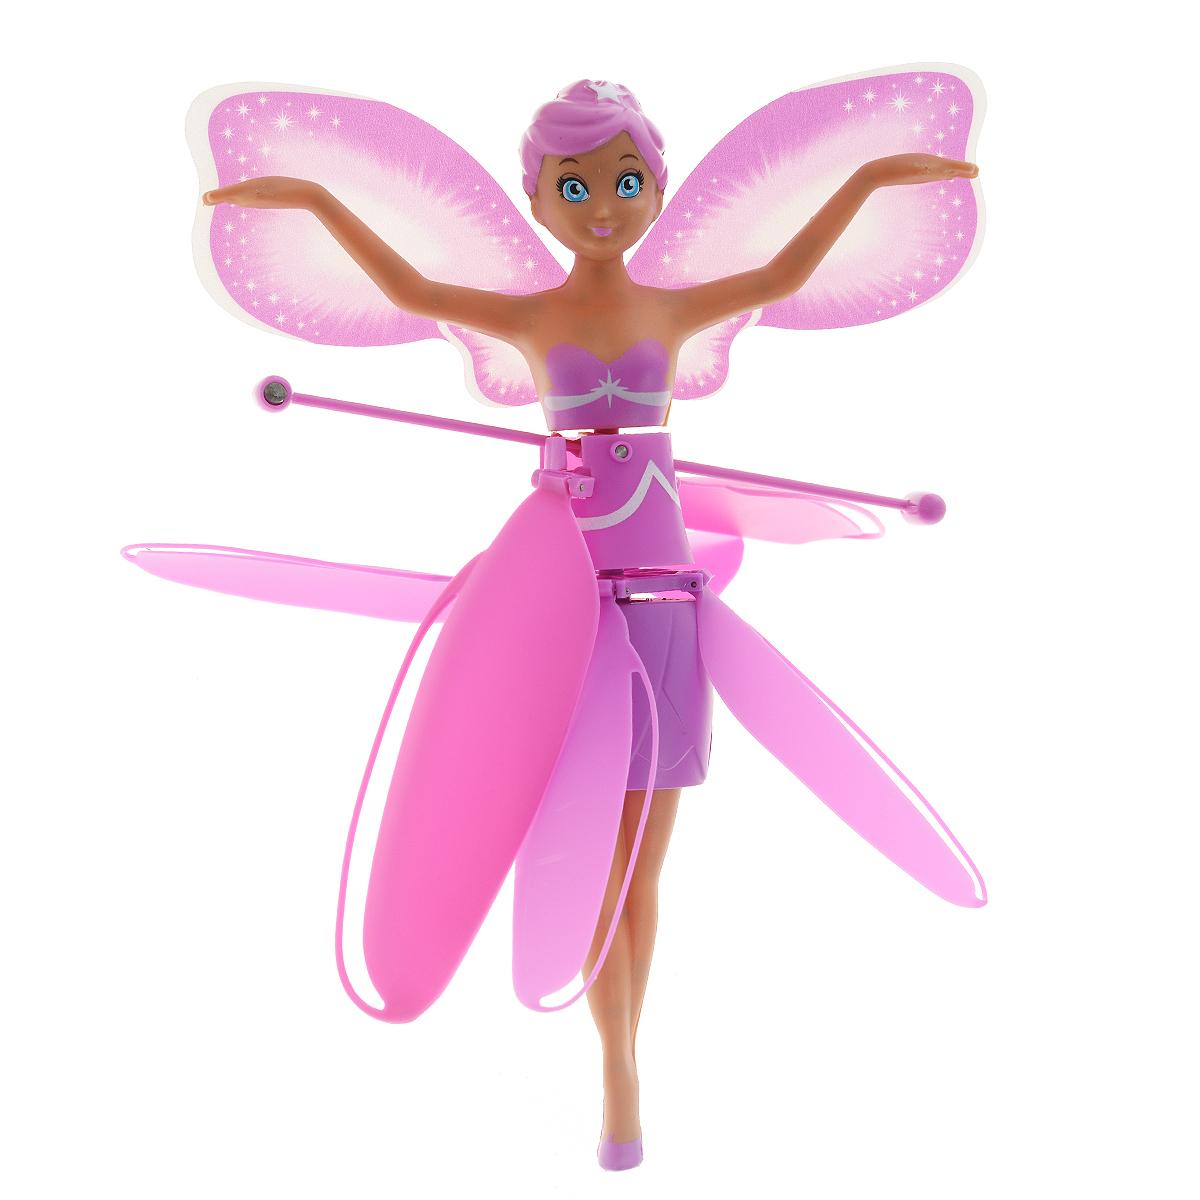 Star Fly Мини-кукла Летающая Принцесса